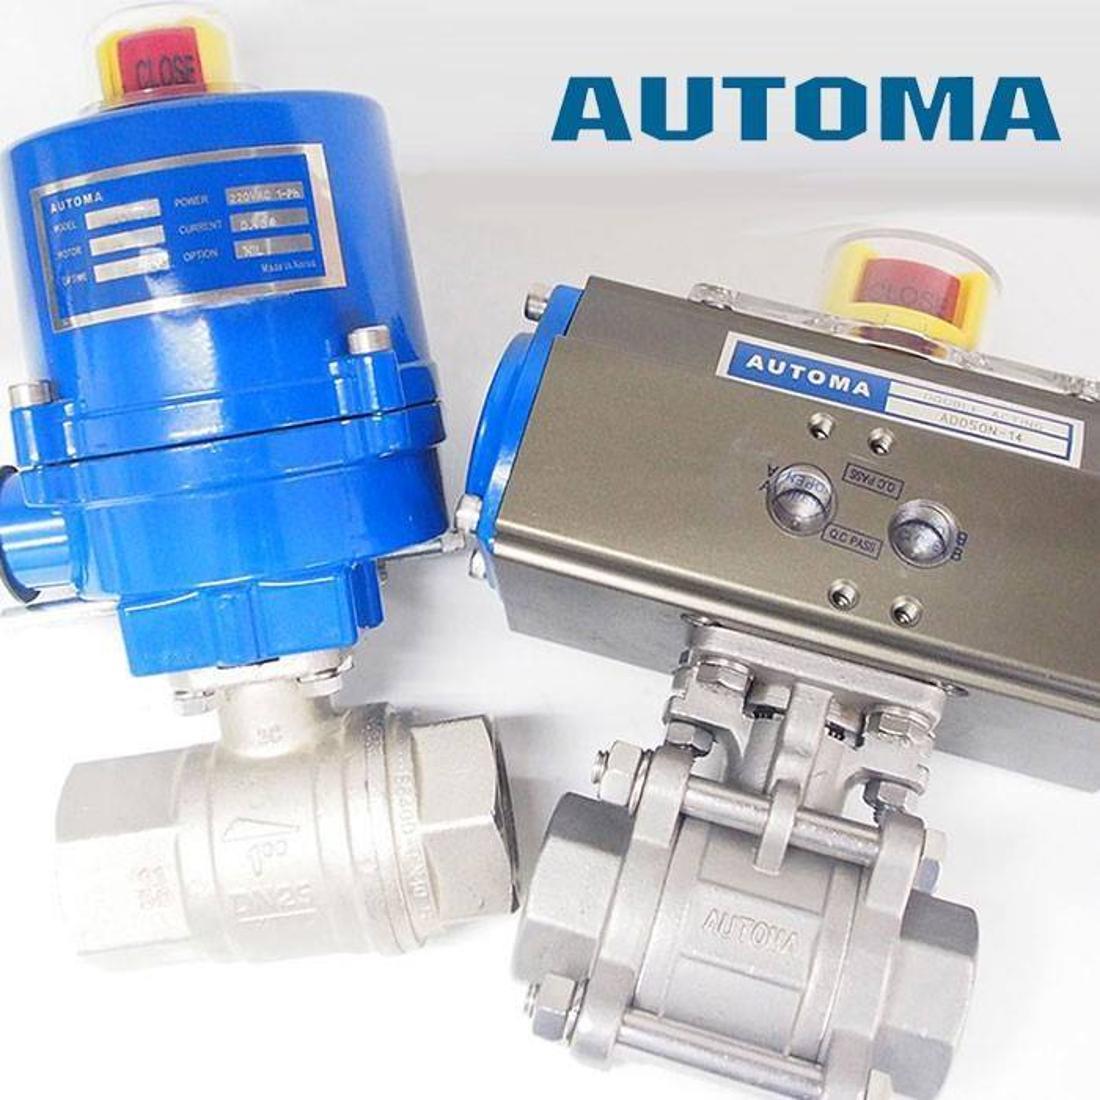 Automa-Actuators-Builtory-Malaysia-2020.jpg